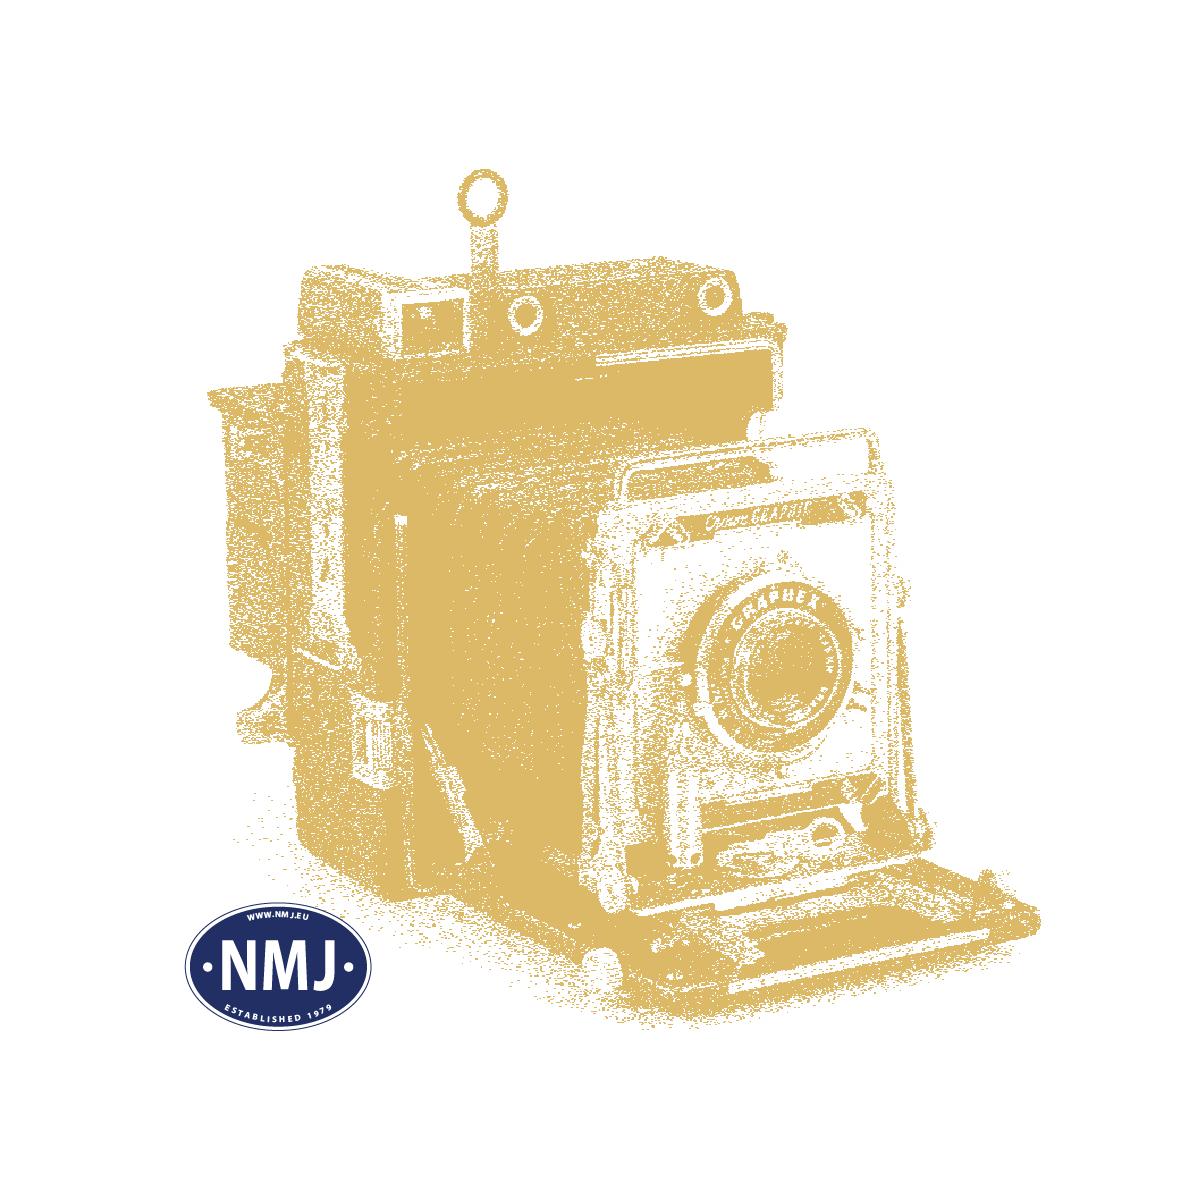 NMJT90303 - NMJ Topline CFL 1604, DCC m/ Lyd